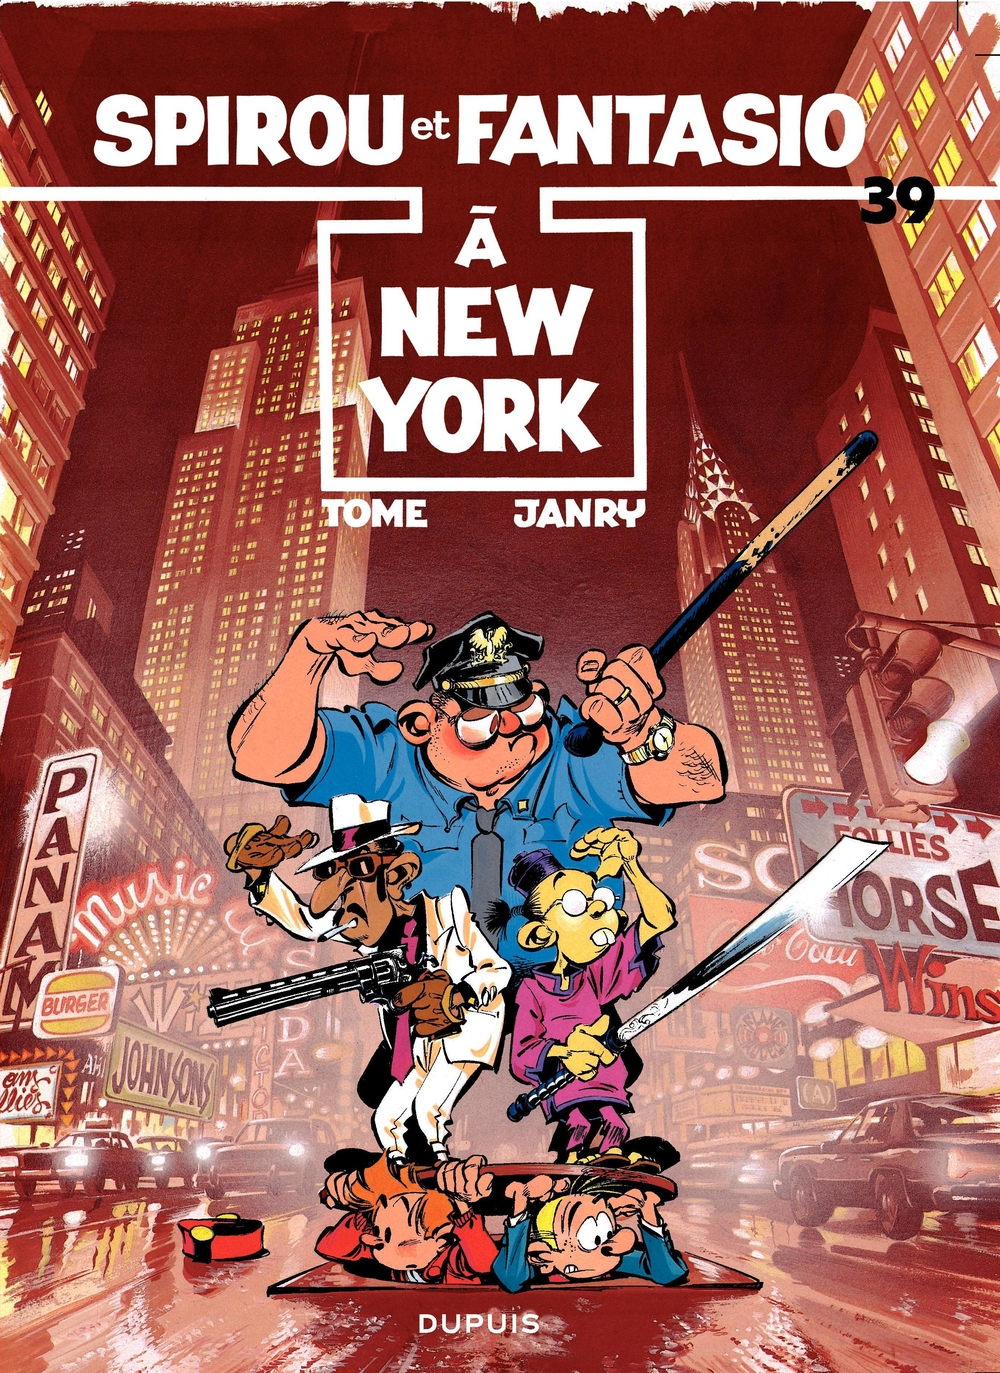 Spirou et Fantasio - Tome 39 - SPIROU A NEW-YORK |